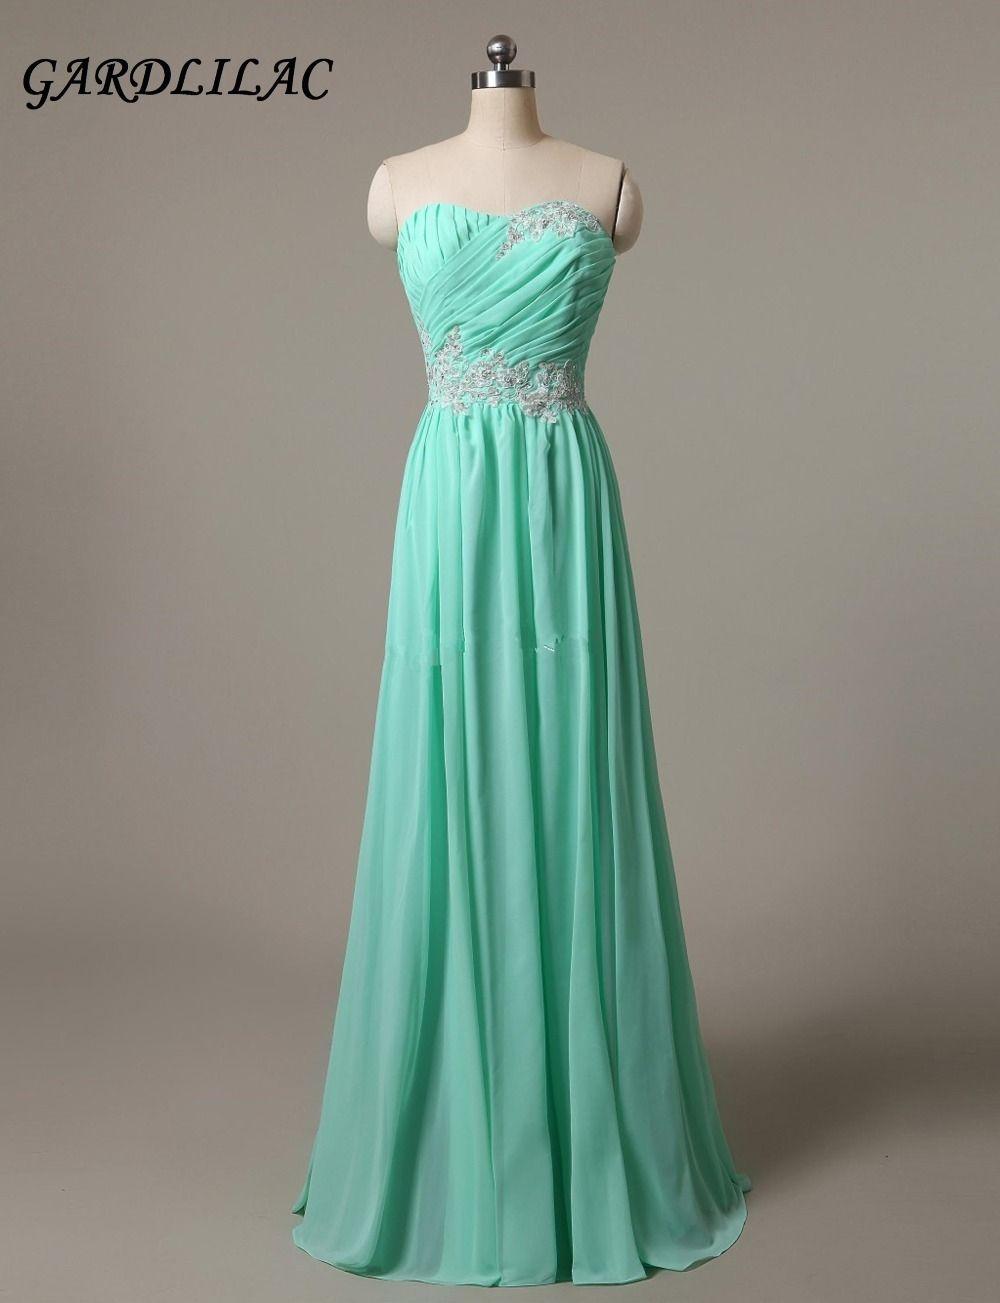 Gardlilac Strapless Mint Long Chiffon Bridesmaid Dresses 2017 Plus ...